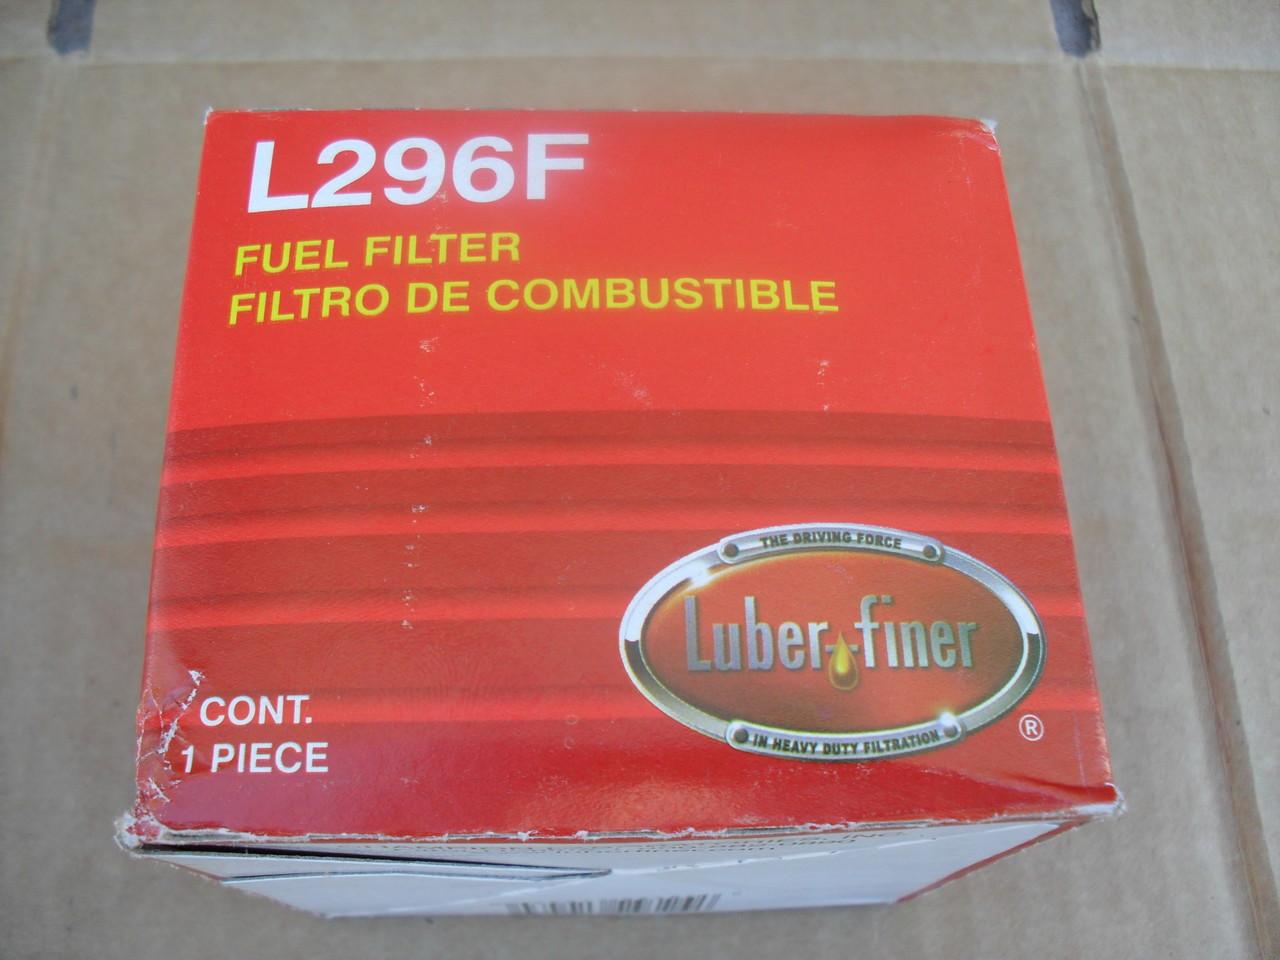 Fuel Filter for Case IH 2400, 2400B, 2405B, 2410B, 2500B, 2544, 2706, 2756, 3400A, 3414, 3444, 3514, 380CK, 3820, 4500A, 4500B, 540, 580, 584, 915319, 960911, E36623, K906708, K915319, K960911